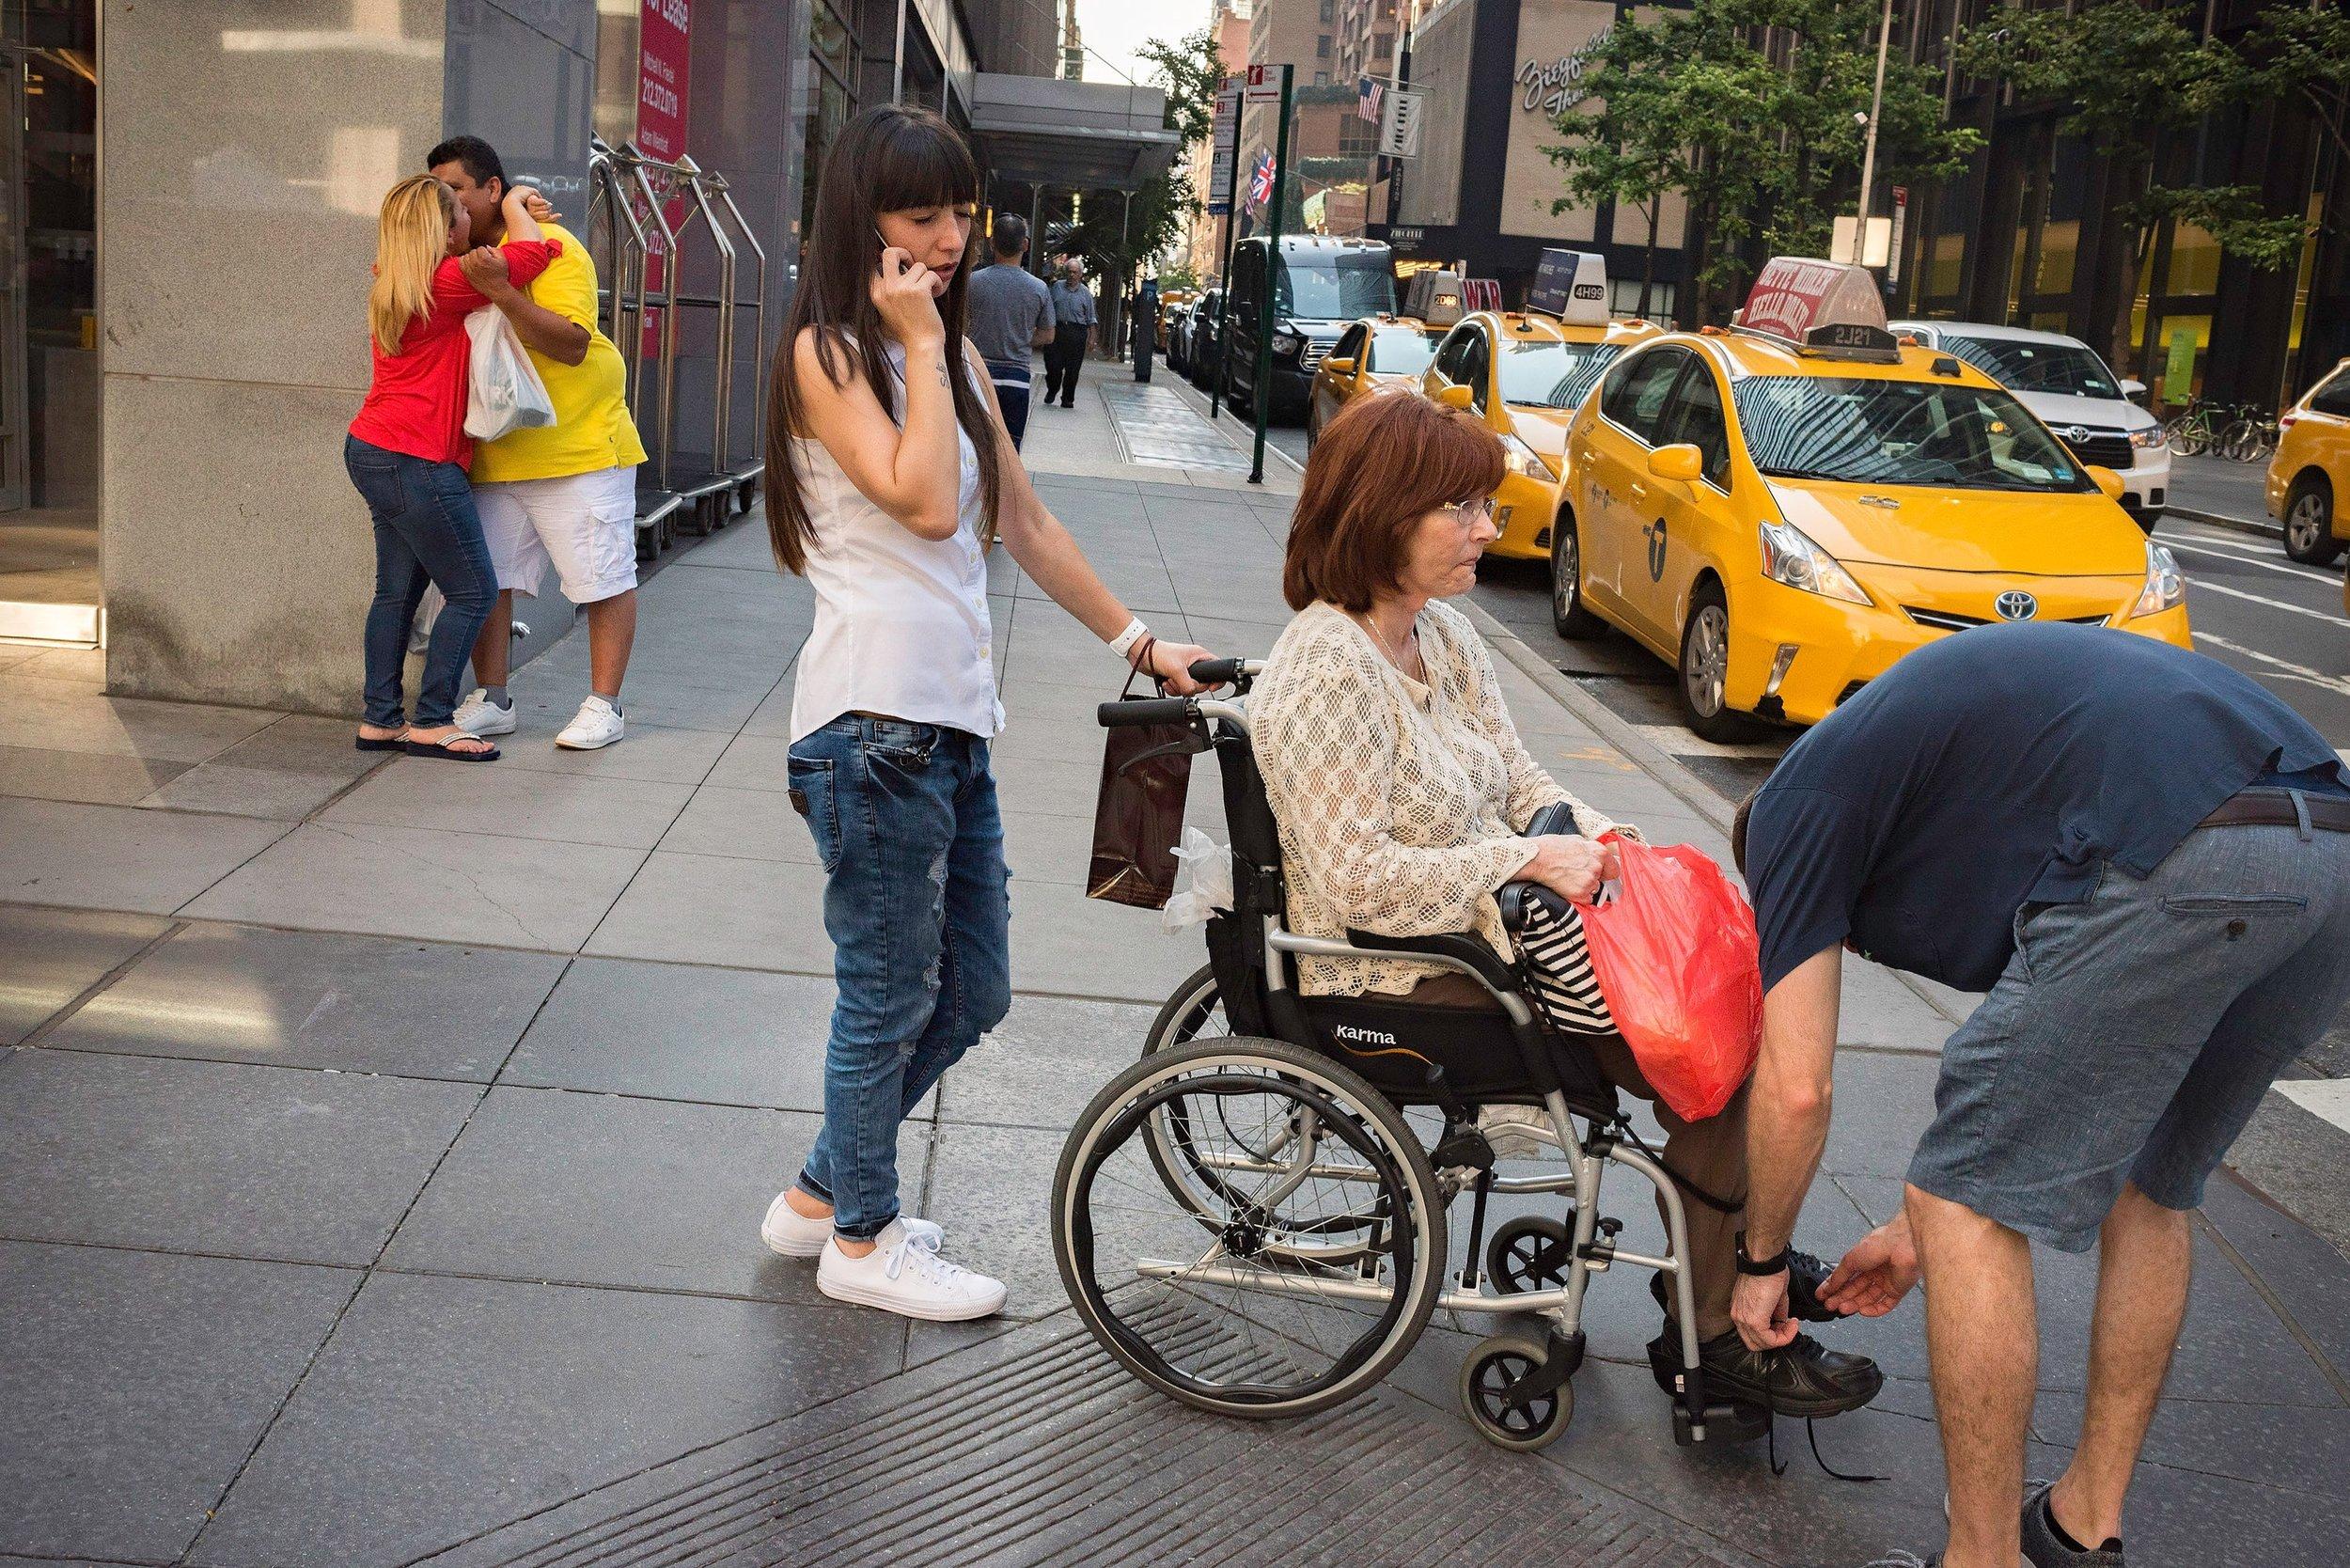 new-york-city-street-photography-collective-frank-multari-10